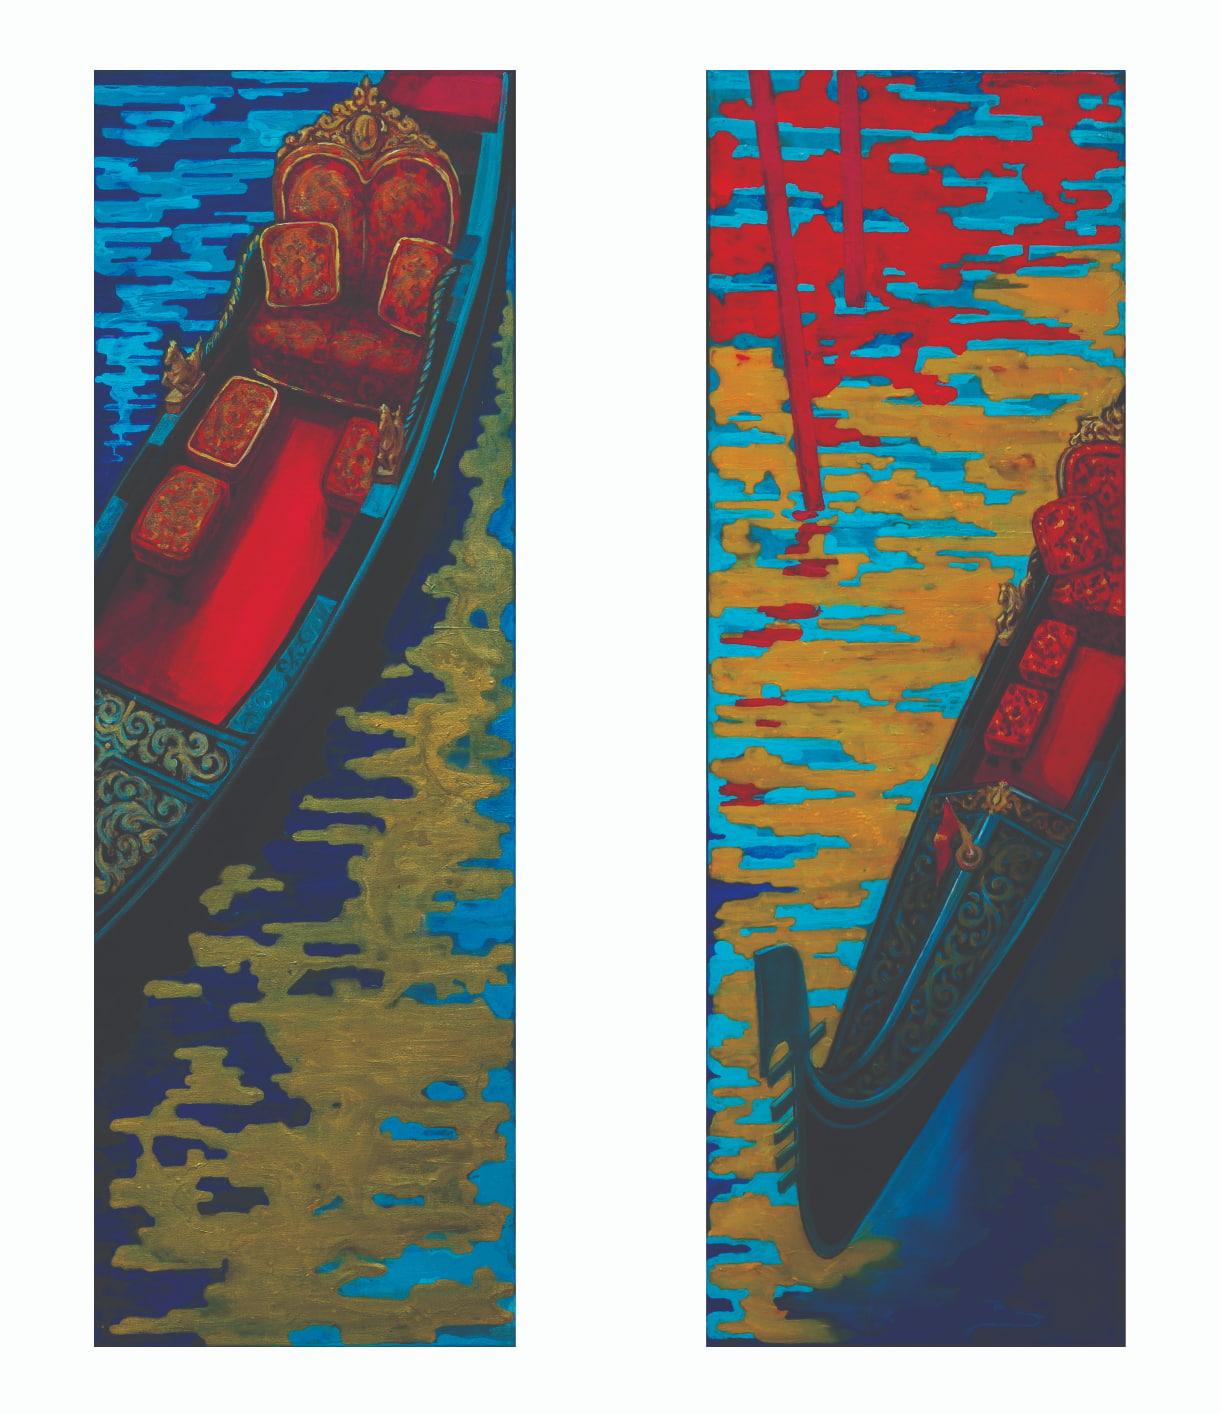 Venice Gondolas_Diptich_Acryl_Leinwand_120_80cm_jpg by Svetlana Catif-Filonova